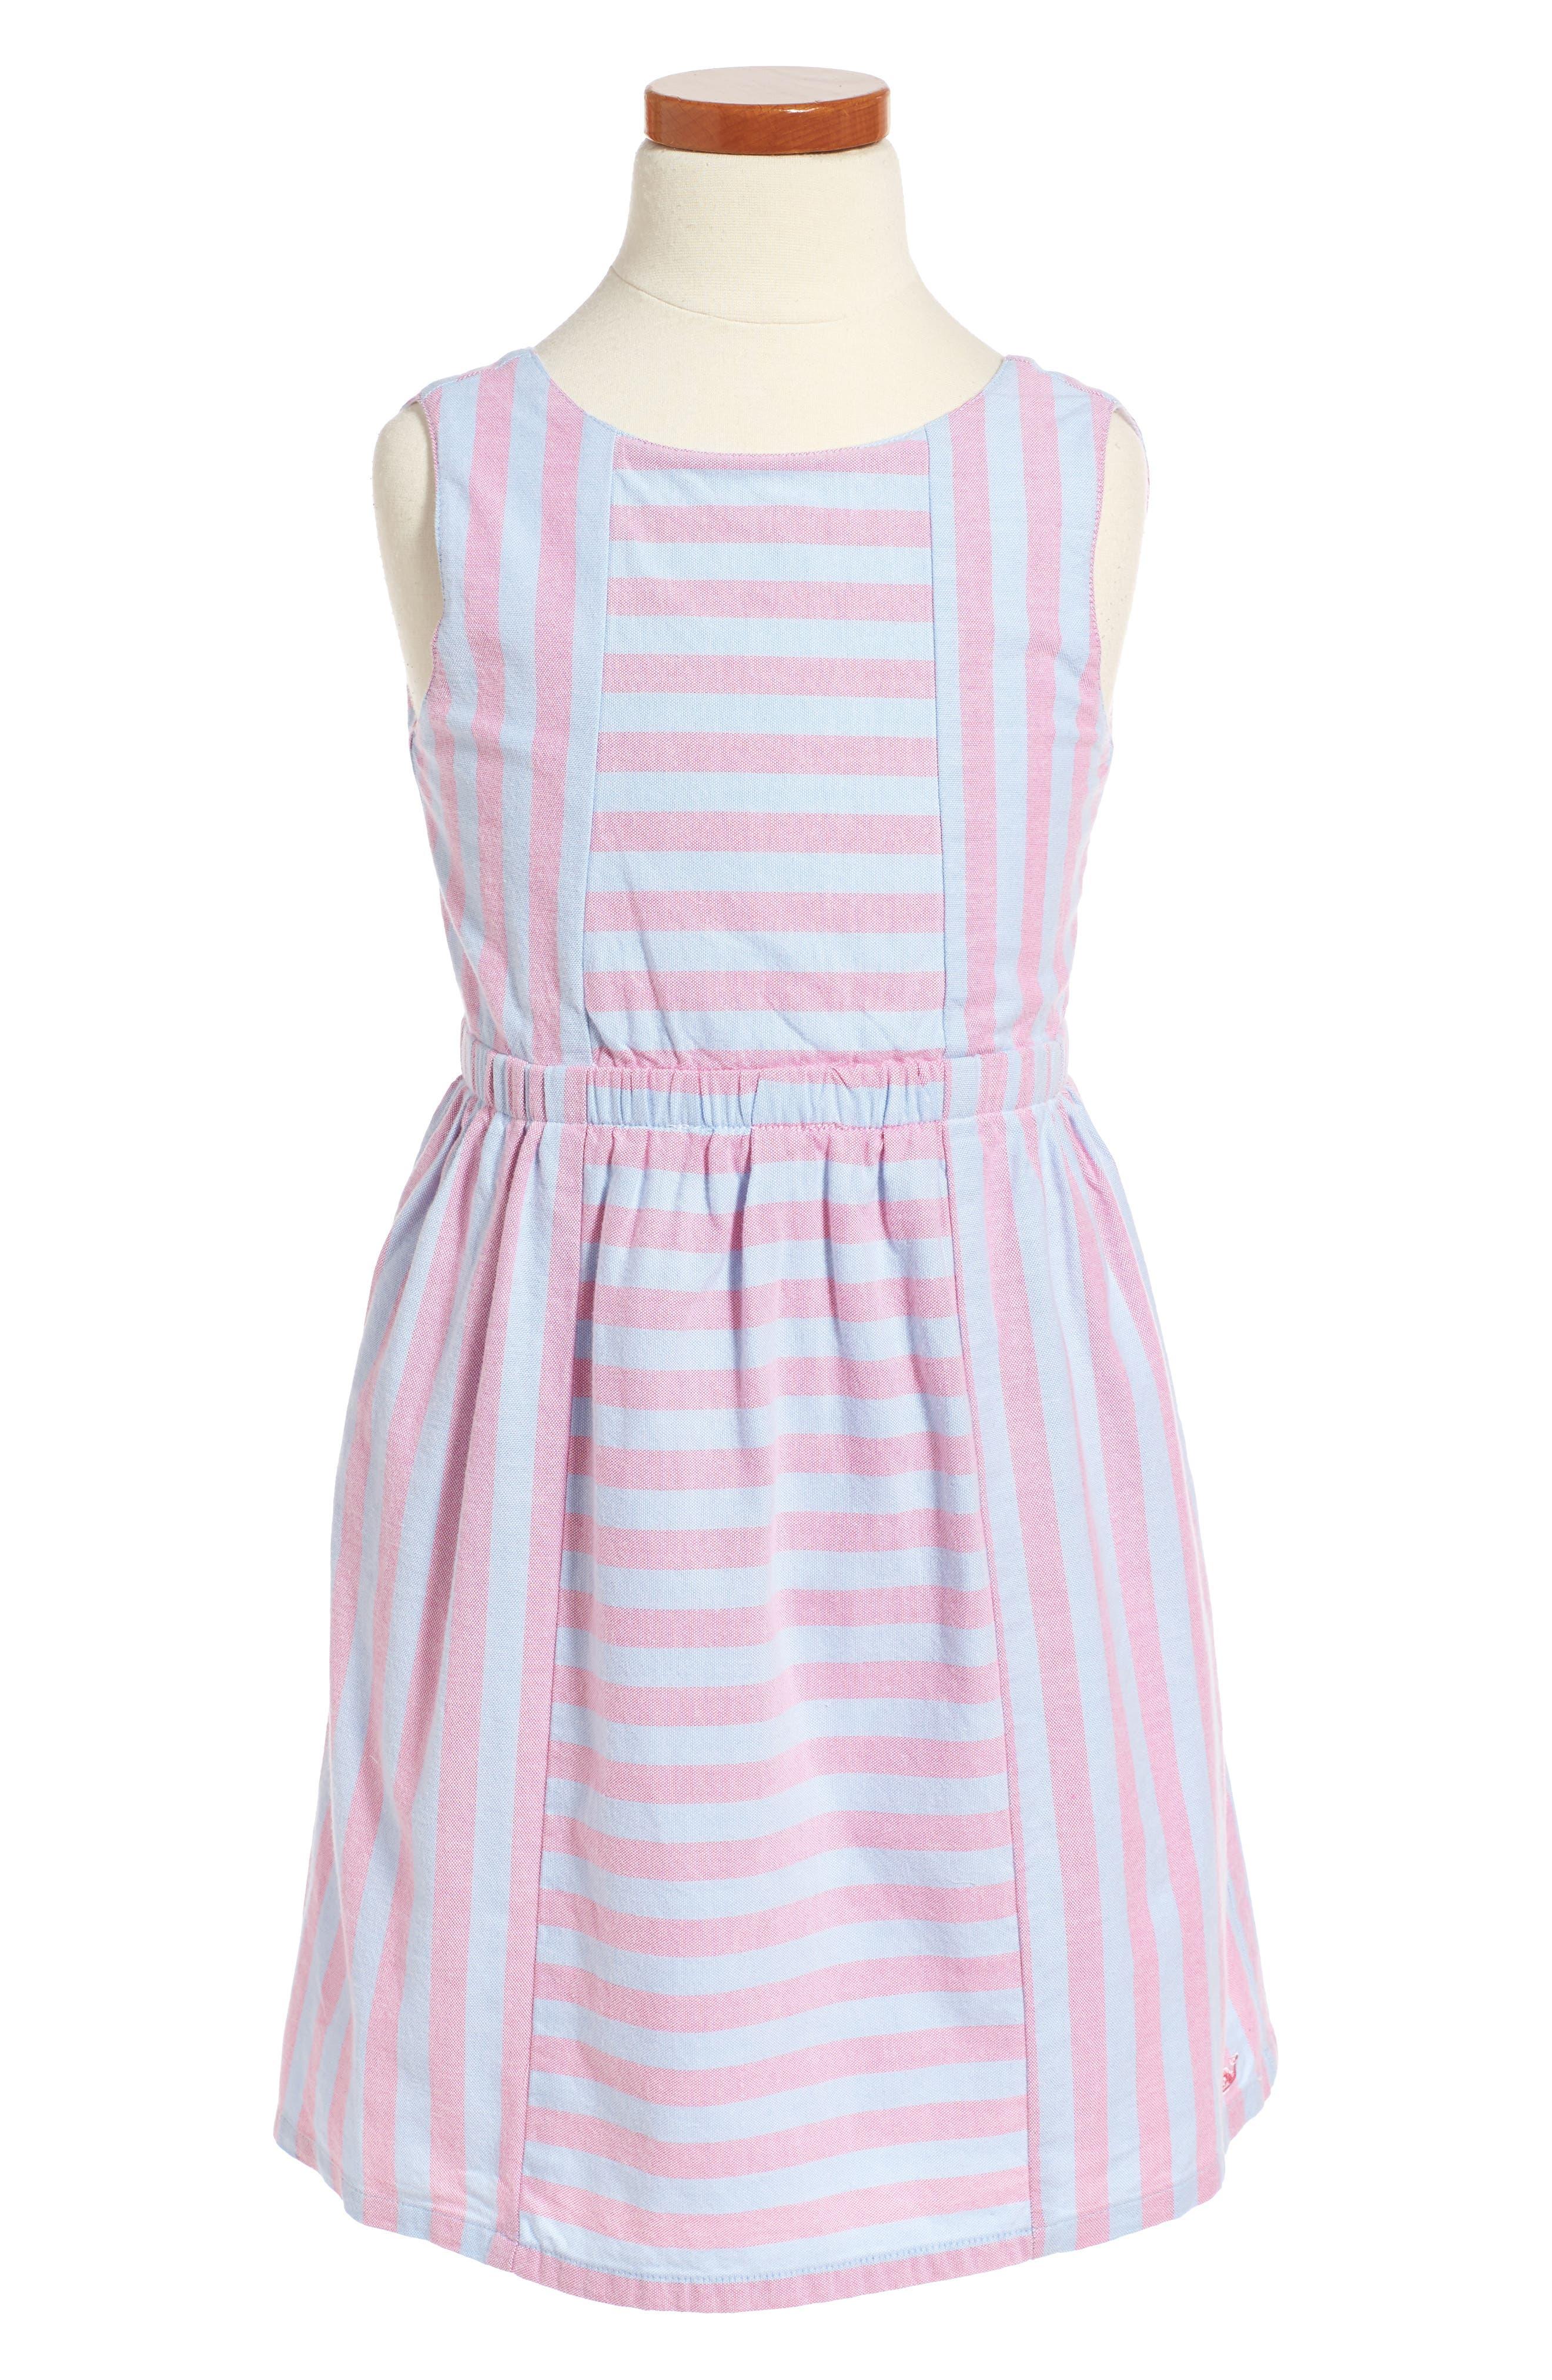 Main Image - vineyard vines Coastside Stripe Dress (Toddler Girls, Little Girls & Big Girls)